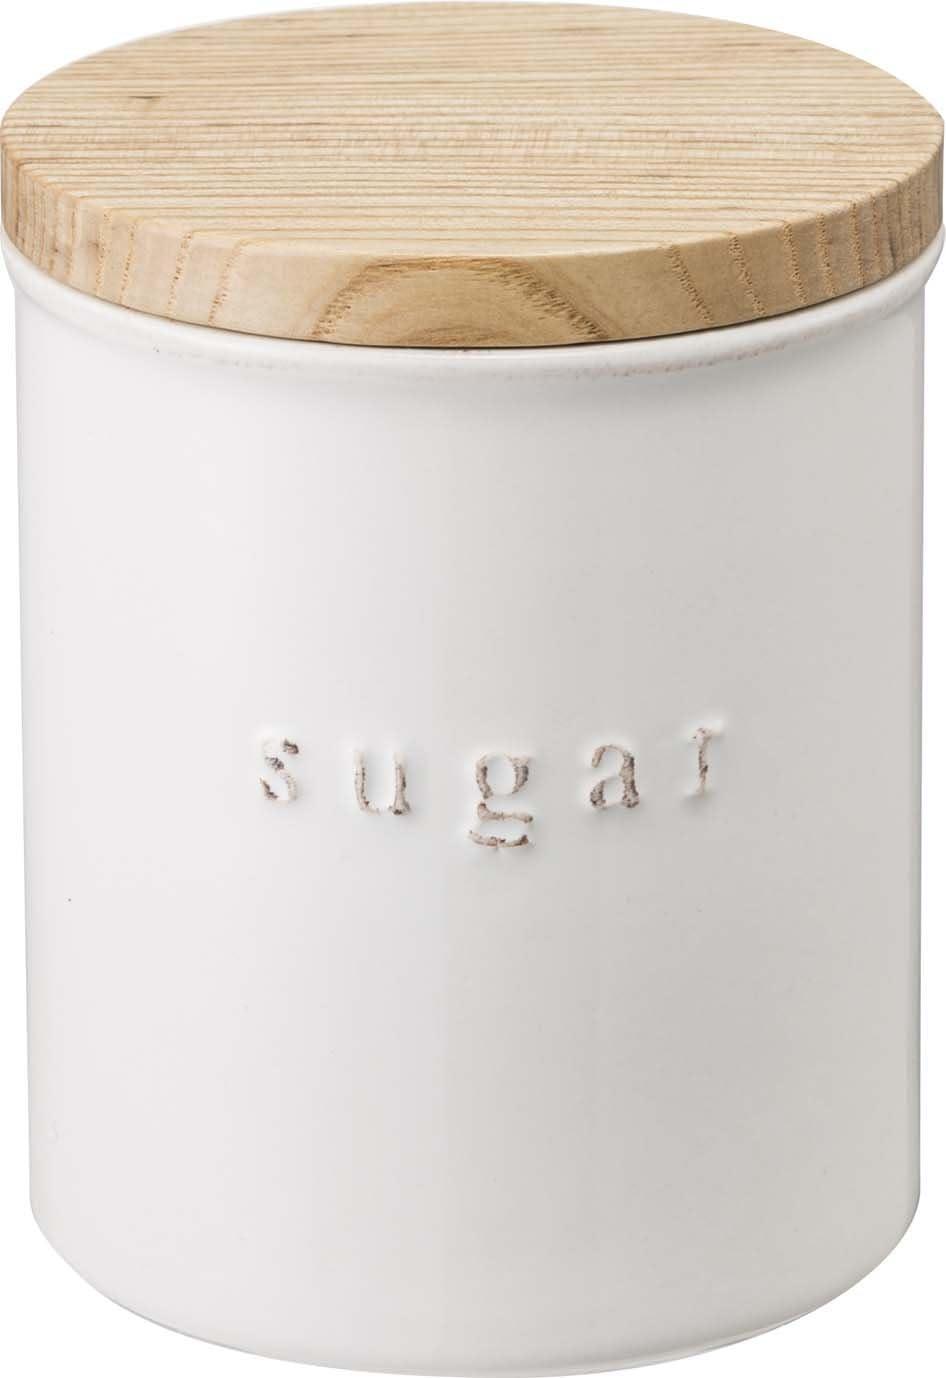 Yamazaki Home Ceramic Canister-Dry Food Kitchen Storage Container Organizer, One Size, White